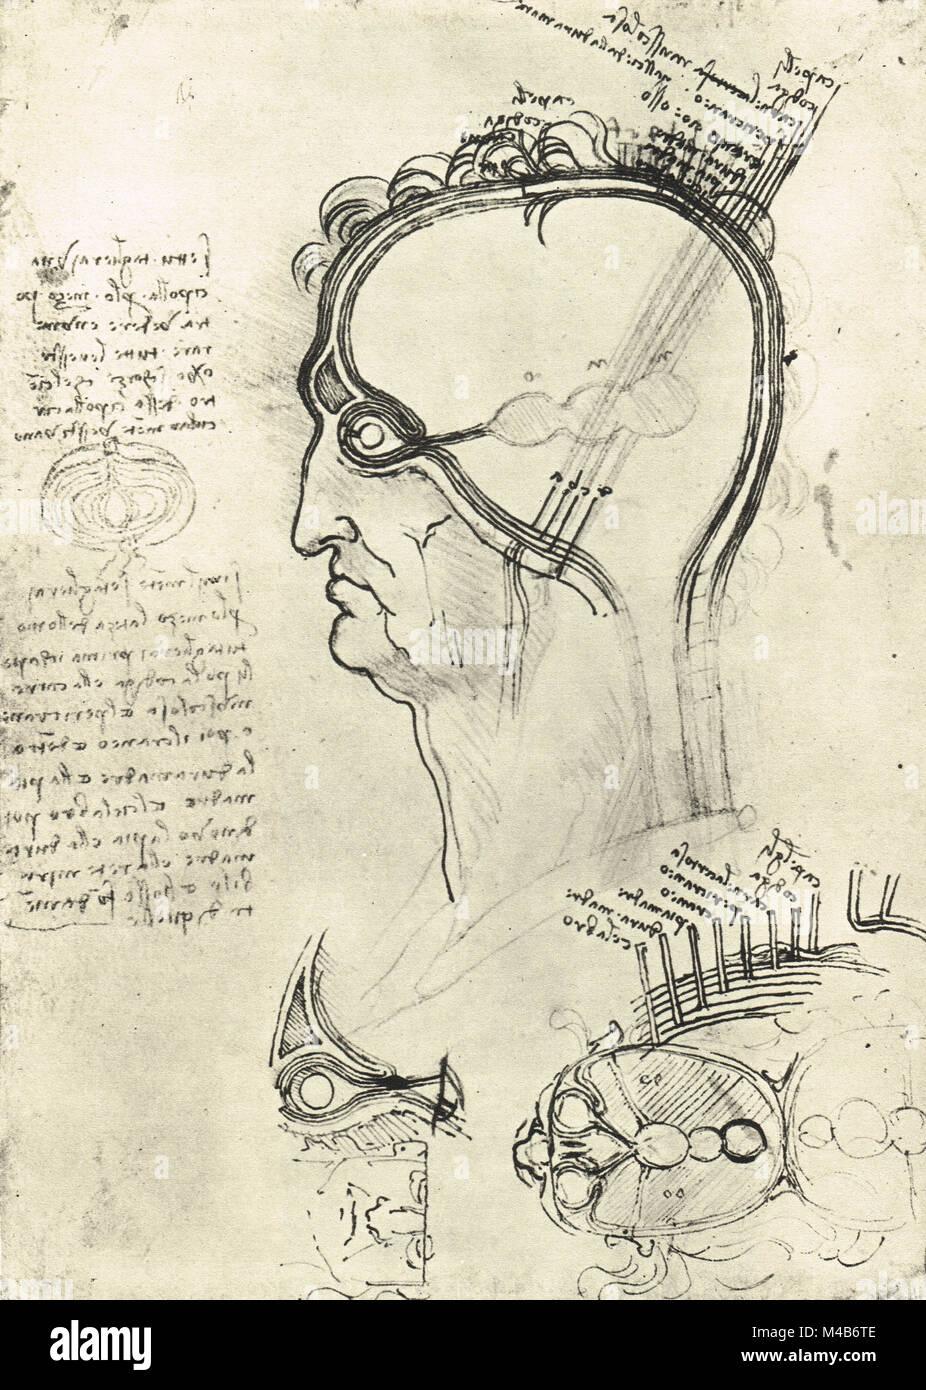 Vinci Anatomy Stockfotos & Vinci Anatomy Bilder - Alamy